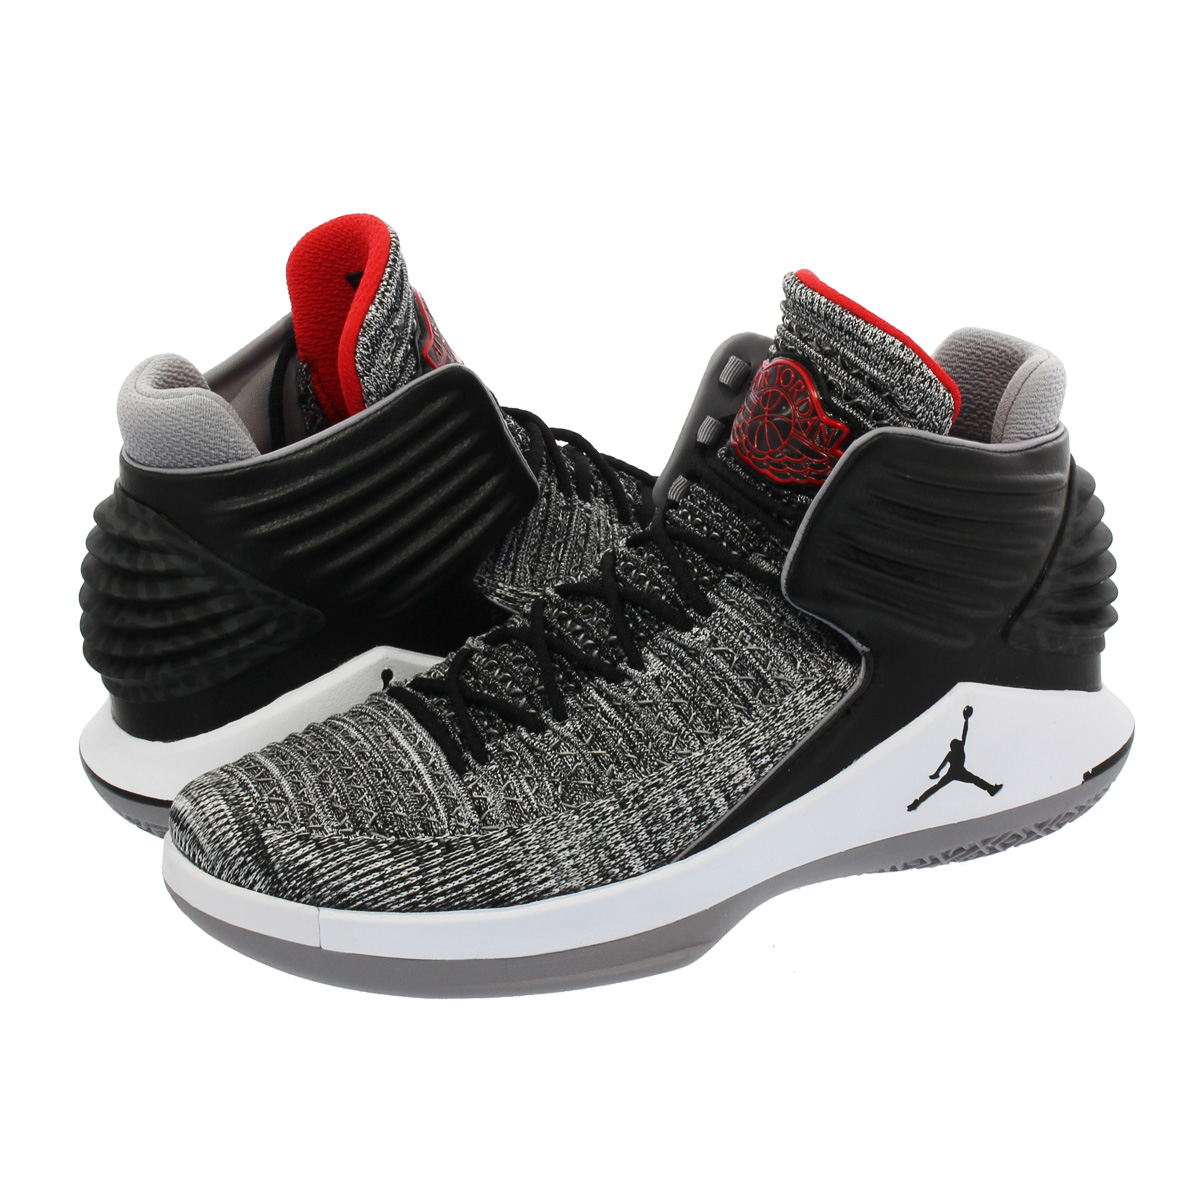 NIKE AIR JORDAN XXXII Nike Air Jordan 32 BLACK UNIVERSITY RED WHITE CEMENT  GREY 0771f4569af